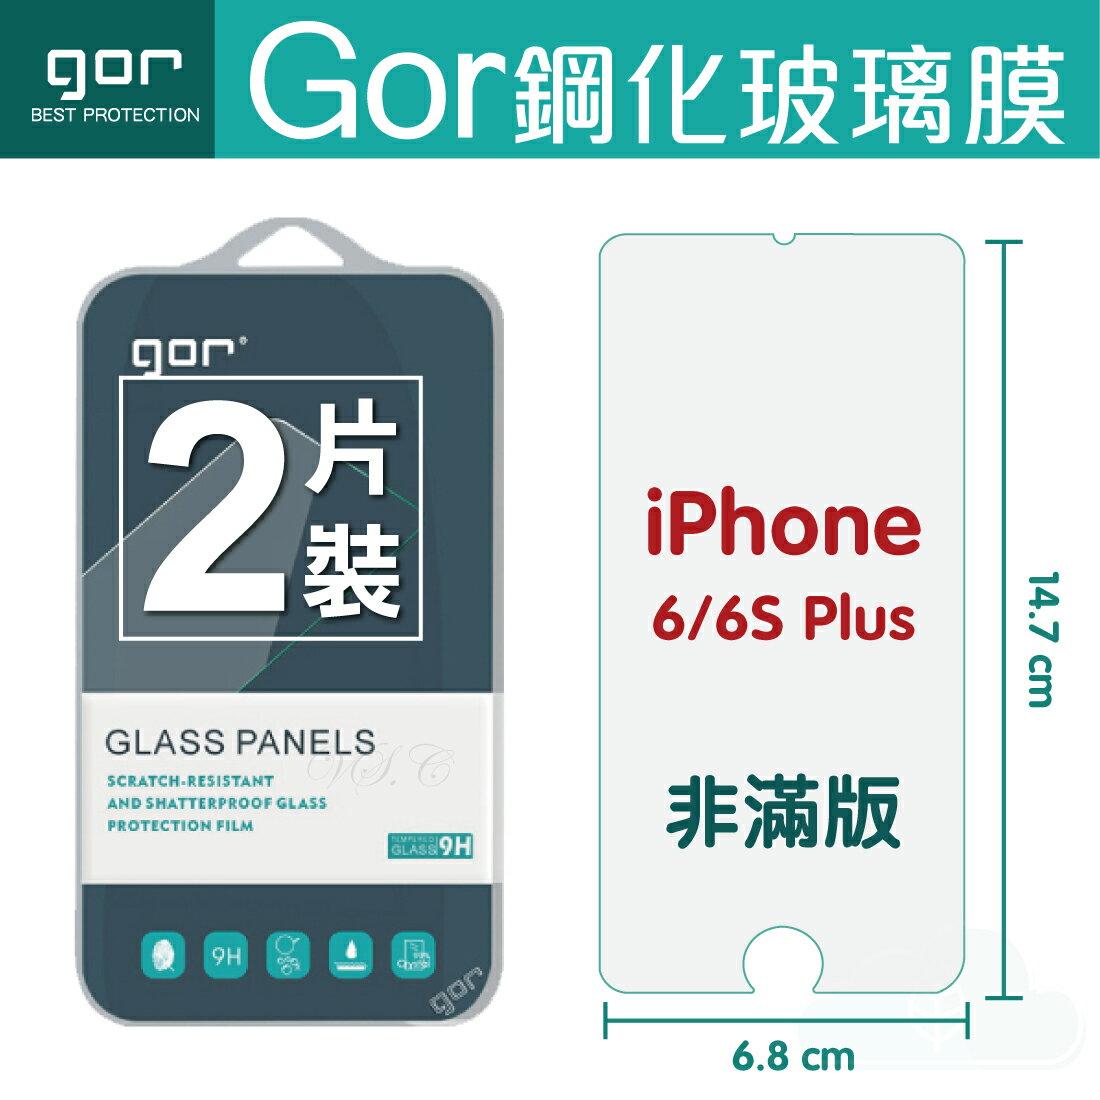 【Apple】GOR 9H iPhone 6 Plus / 6s Plus 鋼化 玻璃 保護貼 全透明非滿版 兩片裝 【全館滿299免運費】